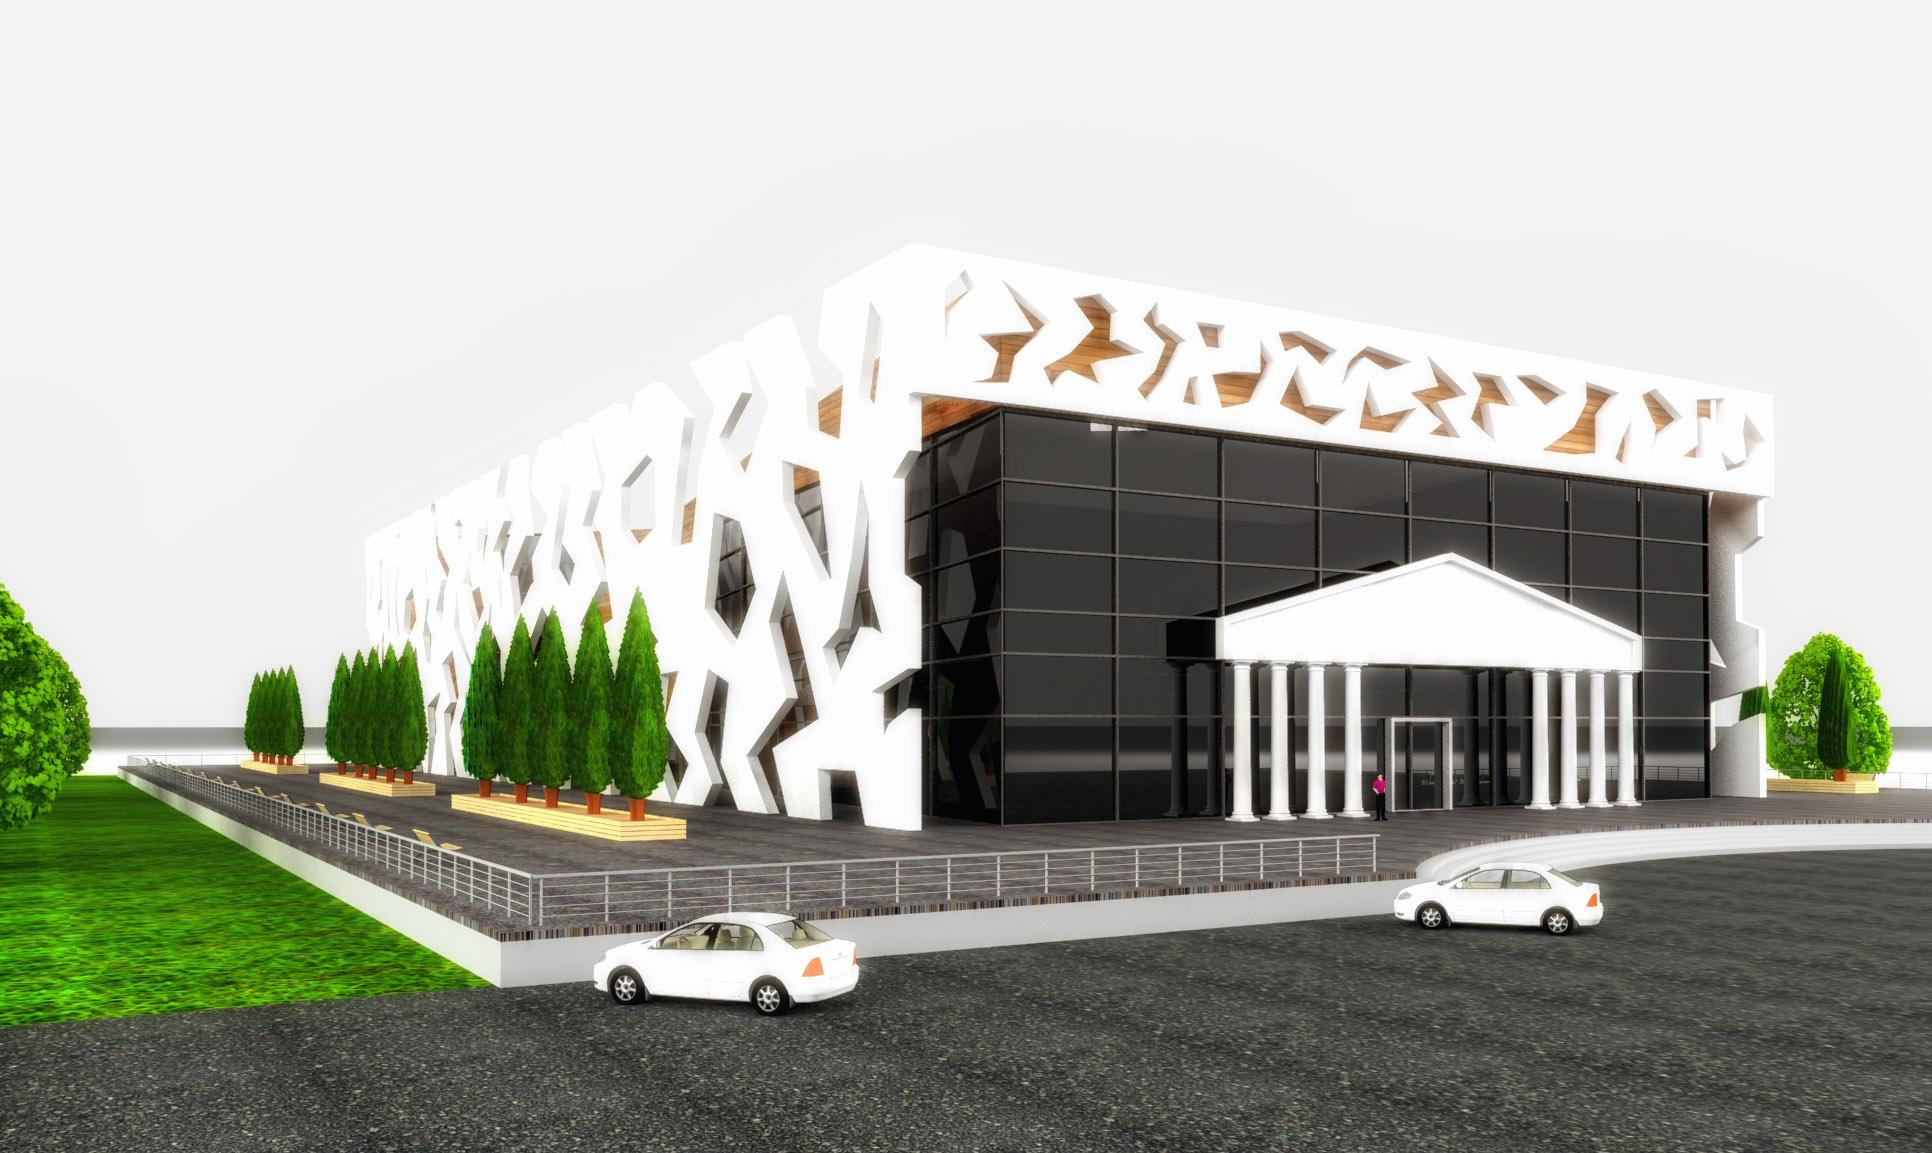 Разработка архитектурной концепции театра оперы и балета фото f_36952f4c9d30db59.jpg